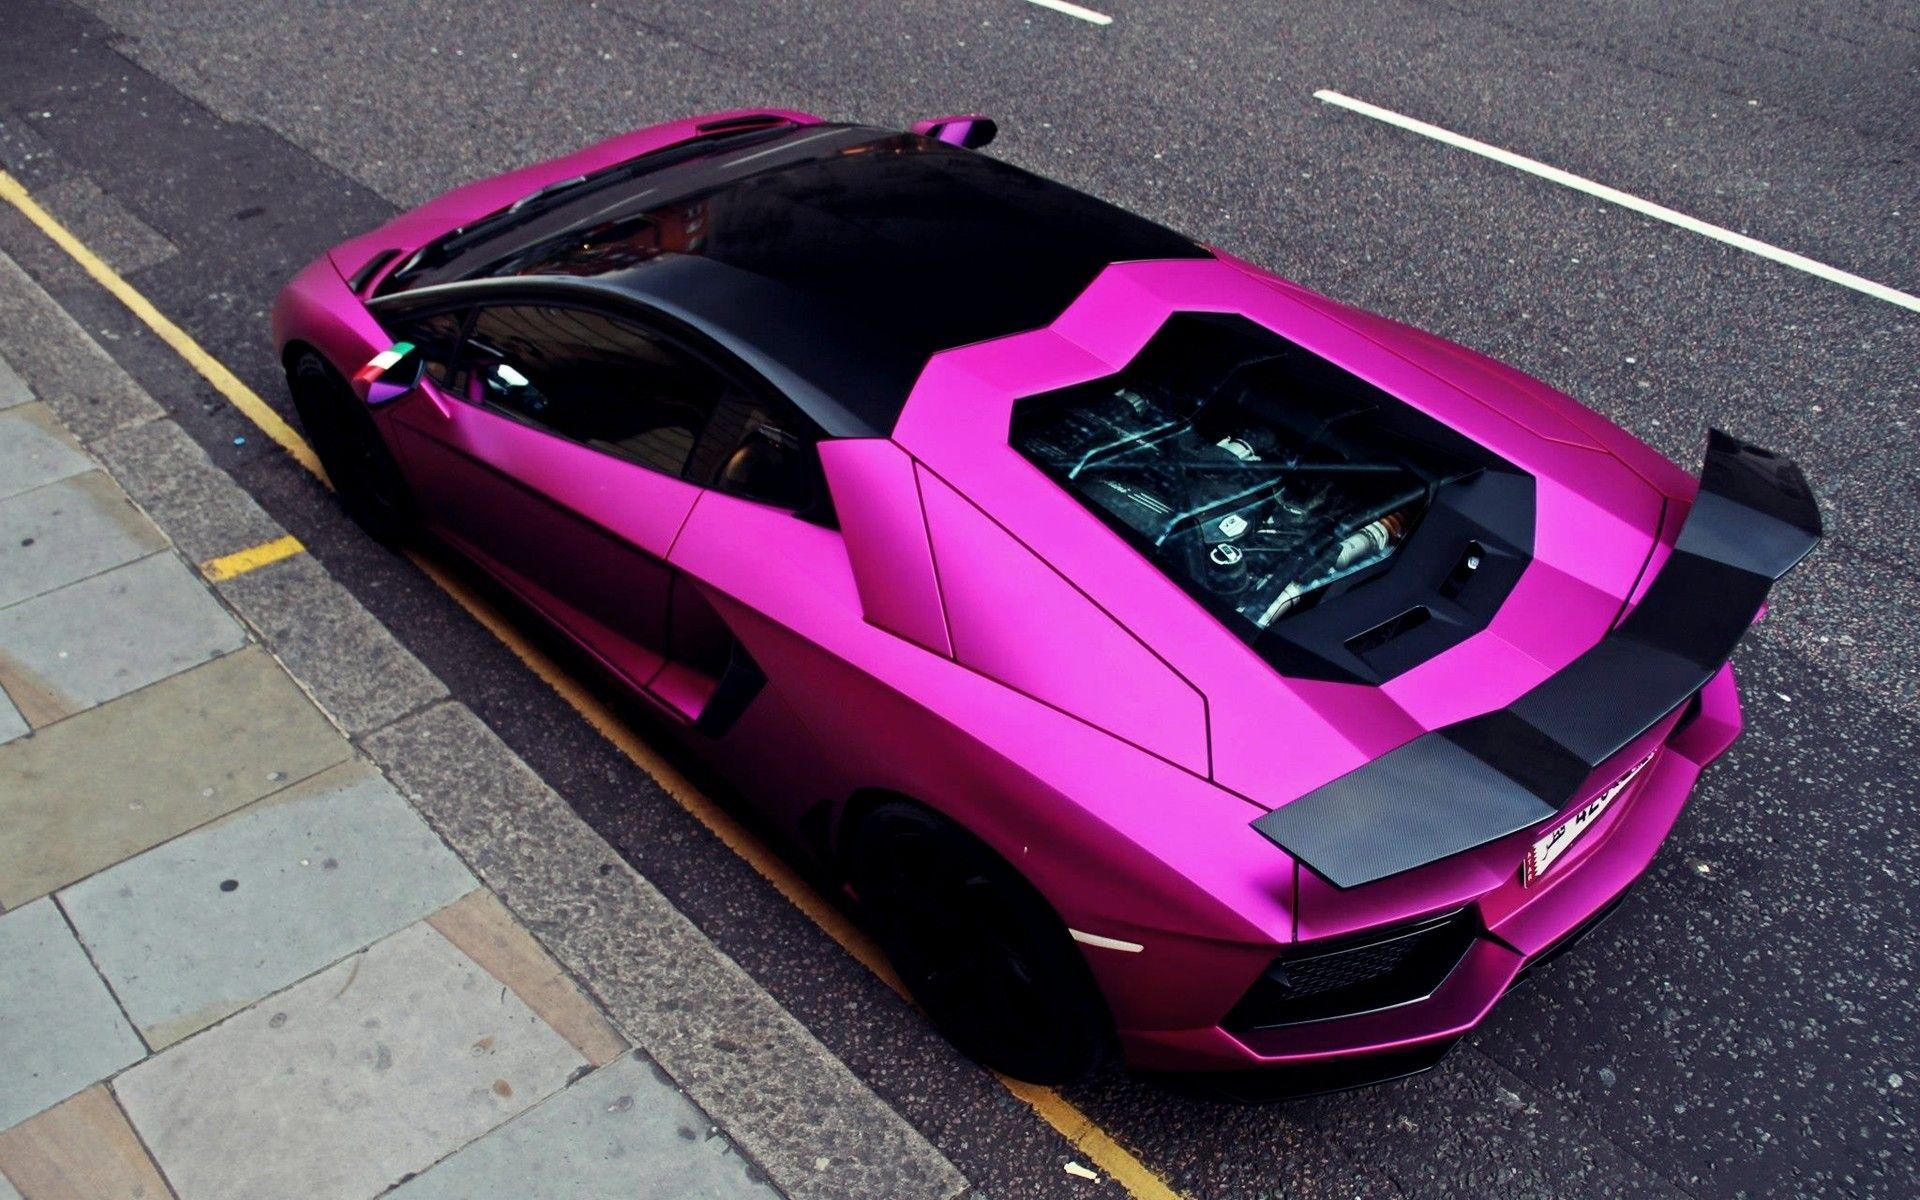 Lamborghini Aventador Lp700 4 1920x1200 Wallpaper Pink Car Lamborghini Sports Cars Luxury